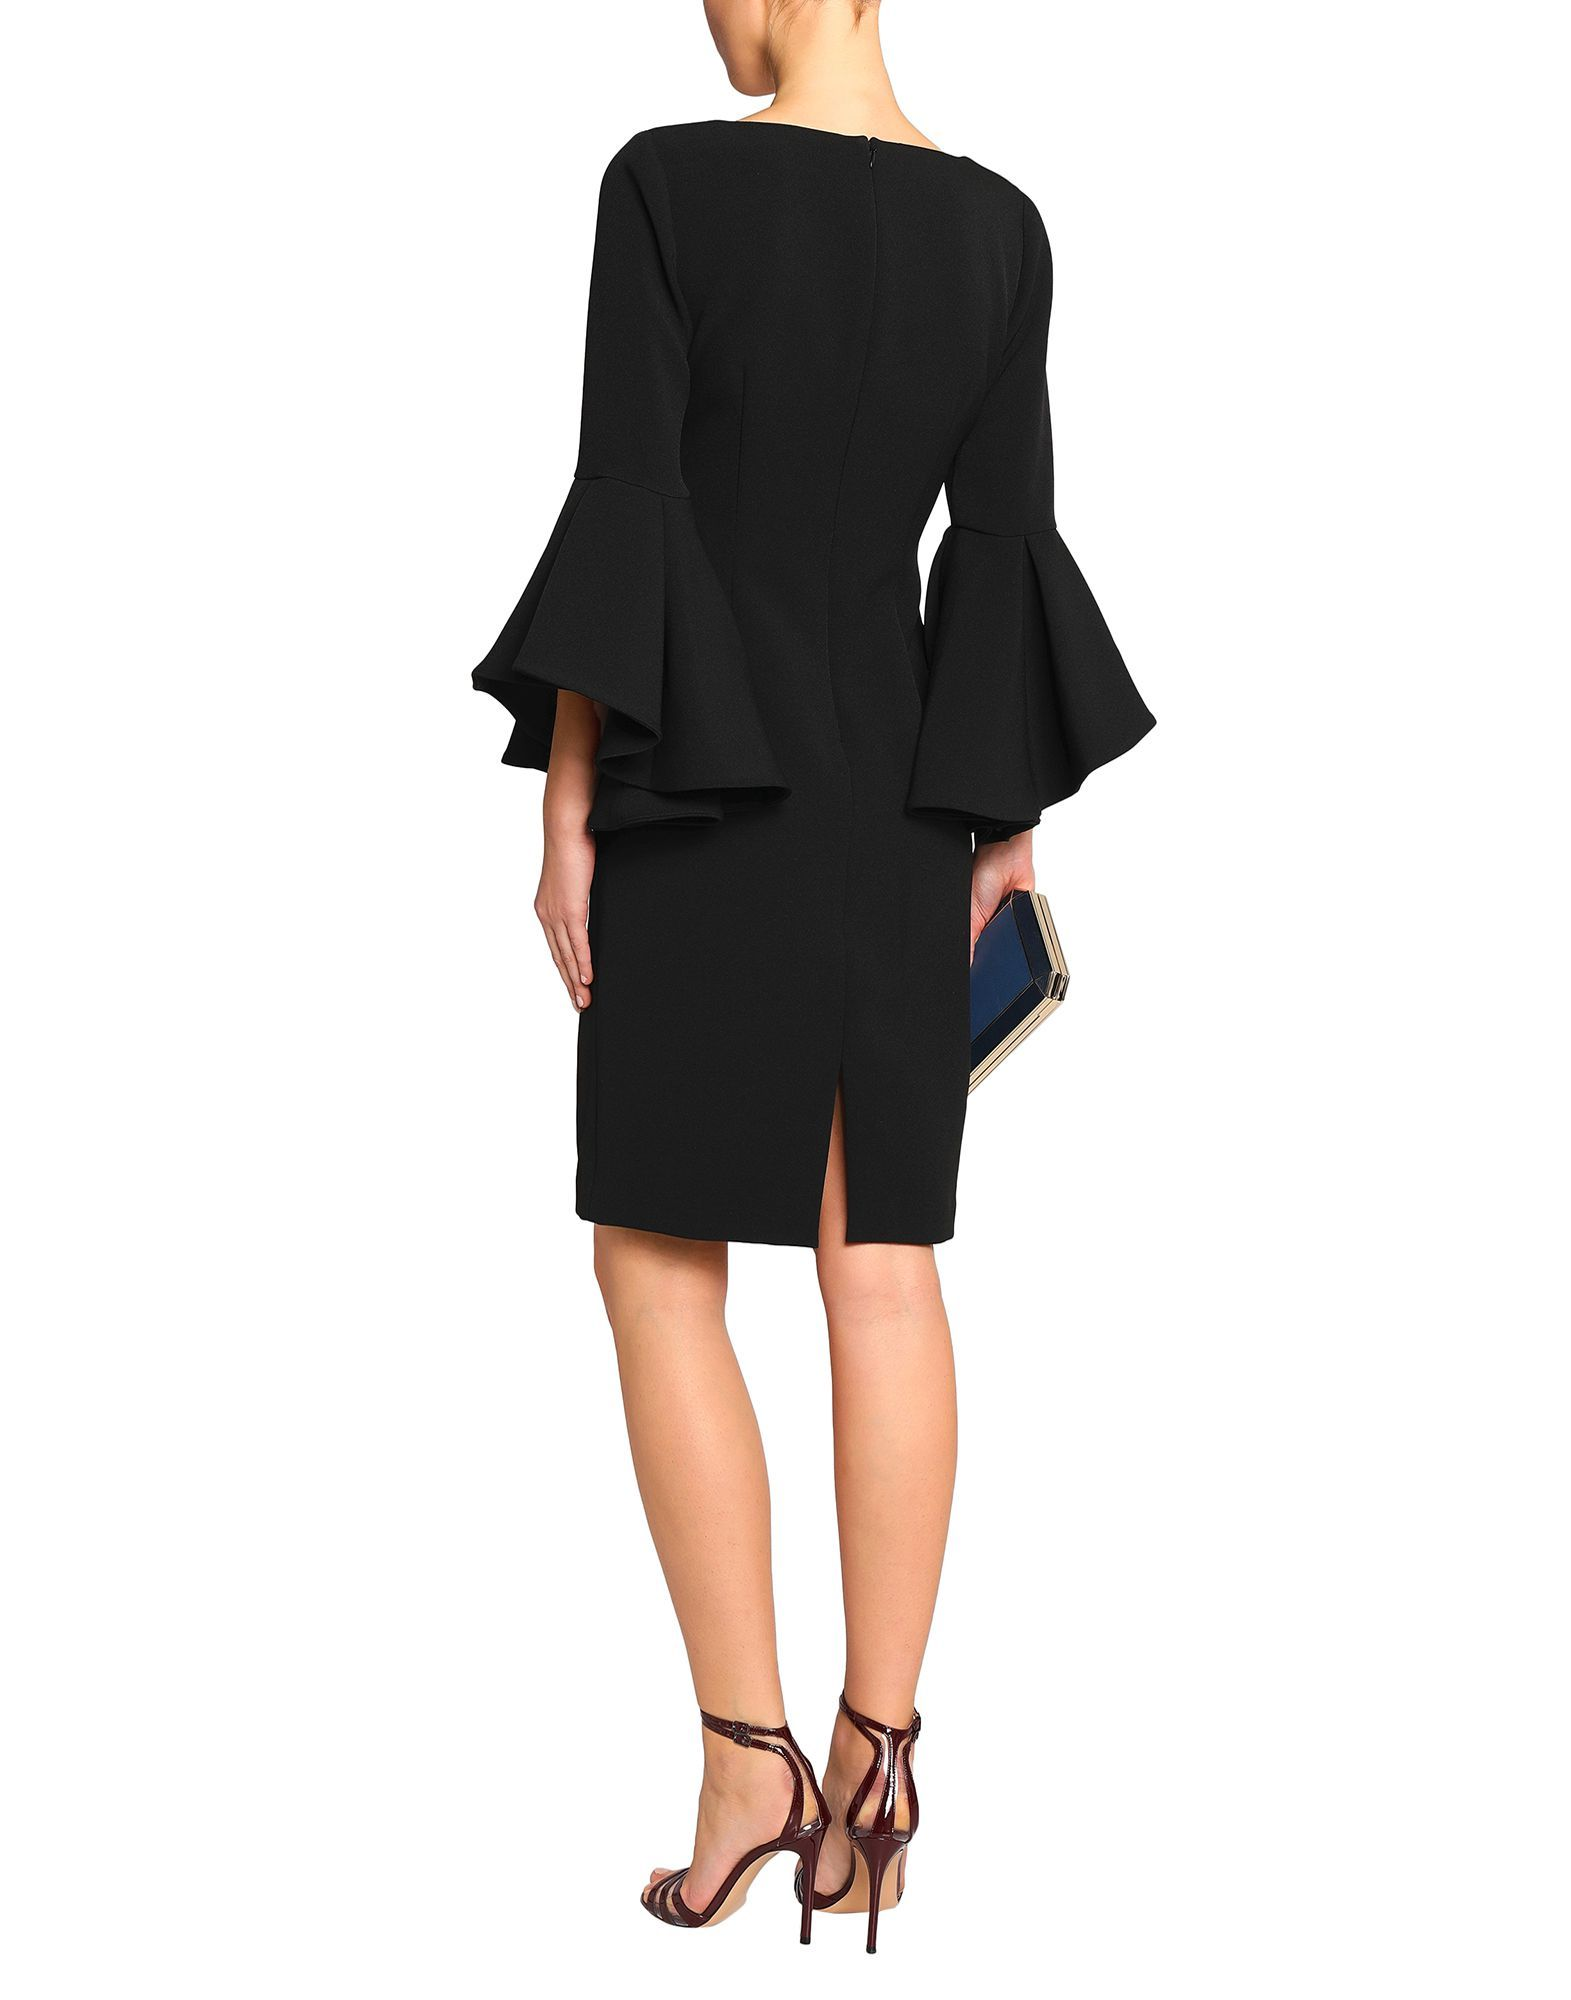 Badgley Mischka Black Long Flared Sleeve Dress